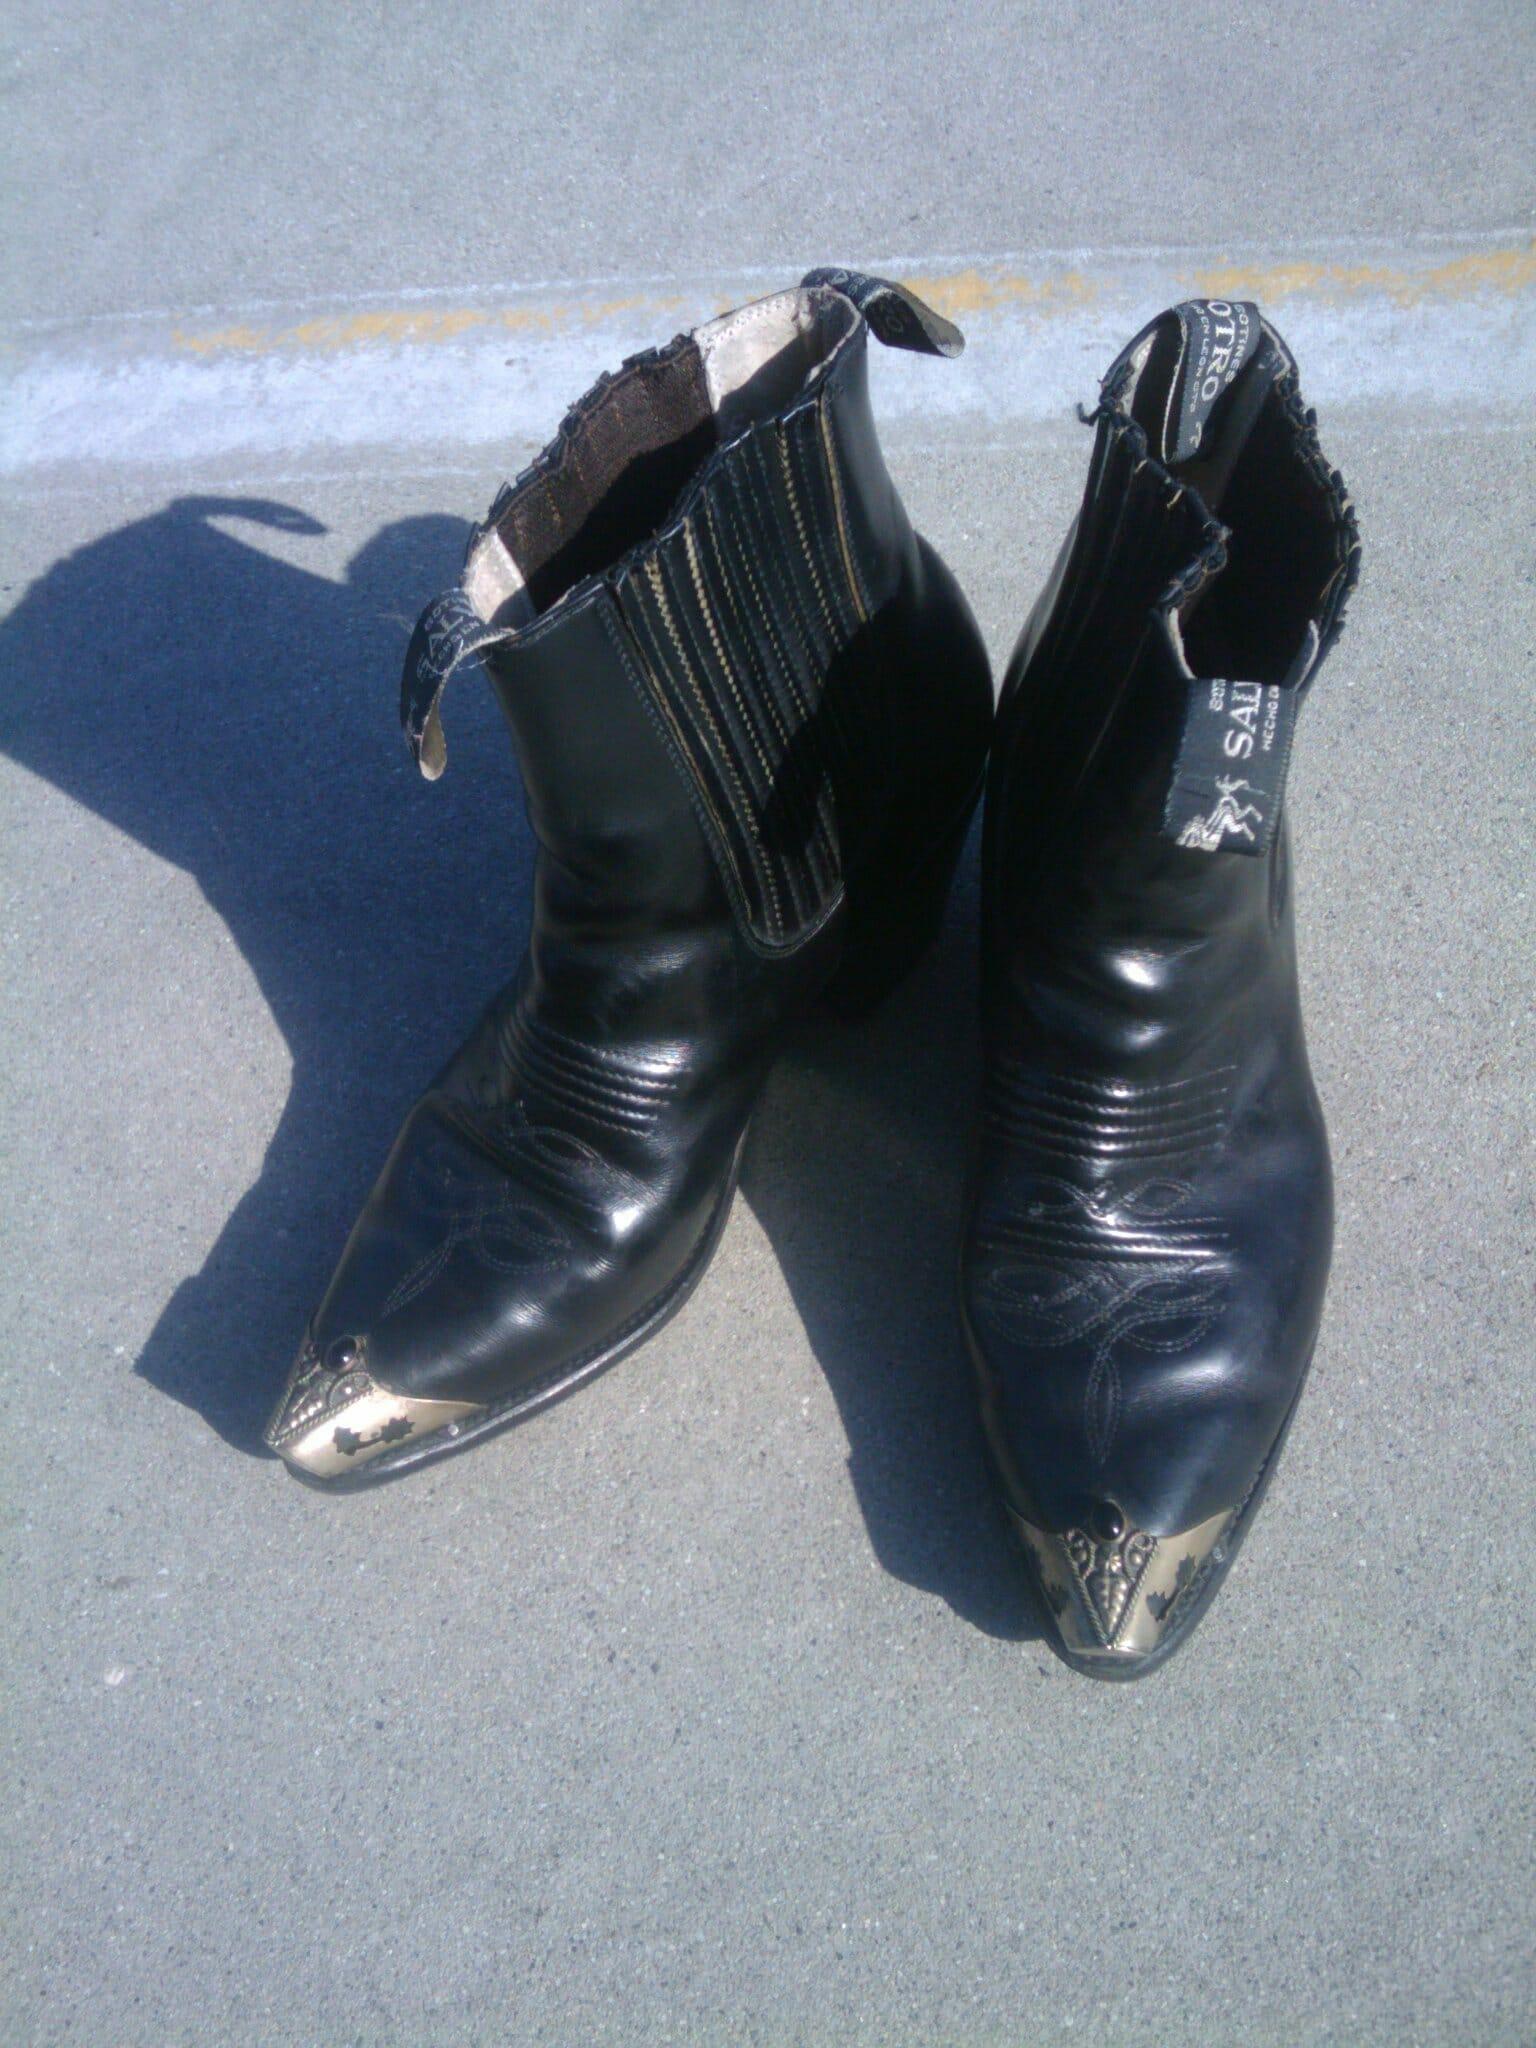 Ricky Ricardo Boots at Metropolis